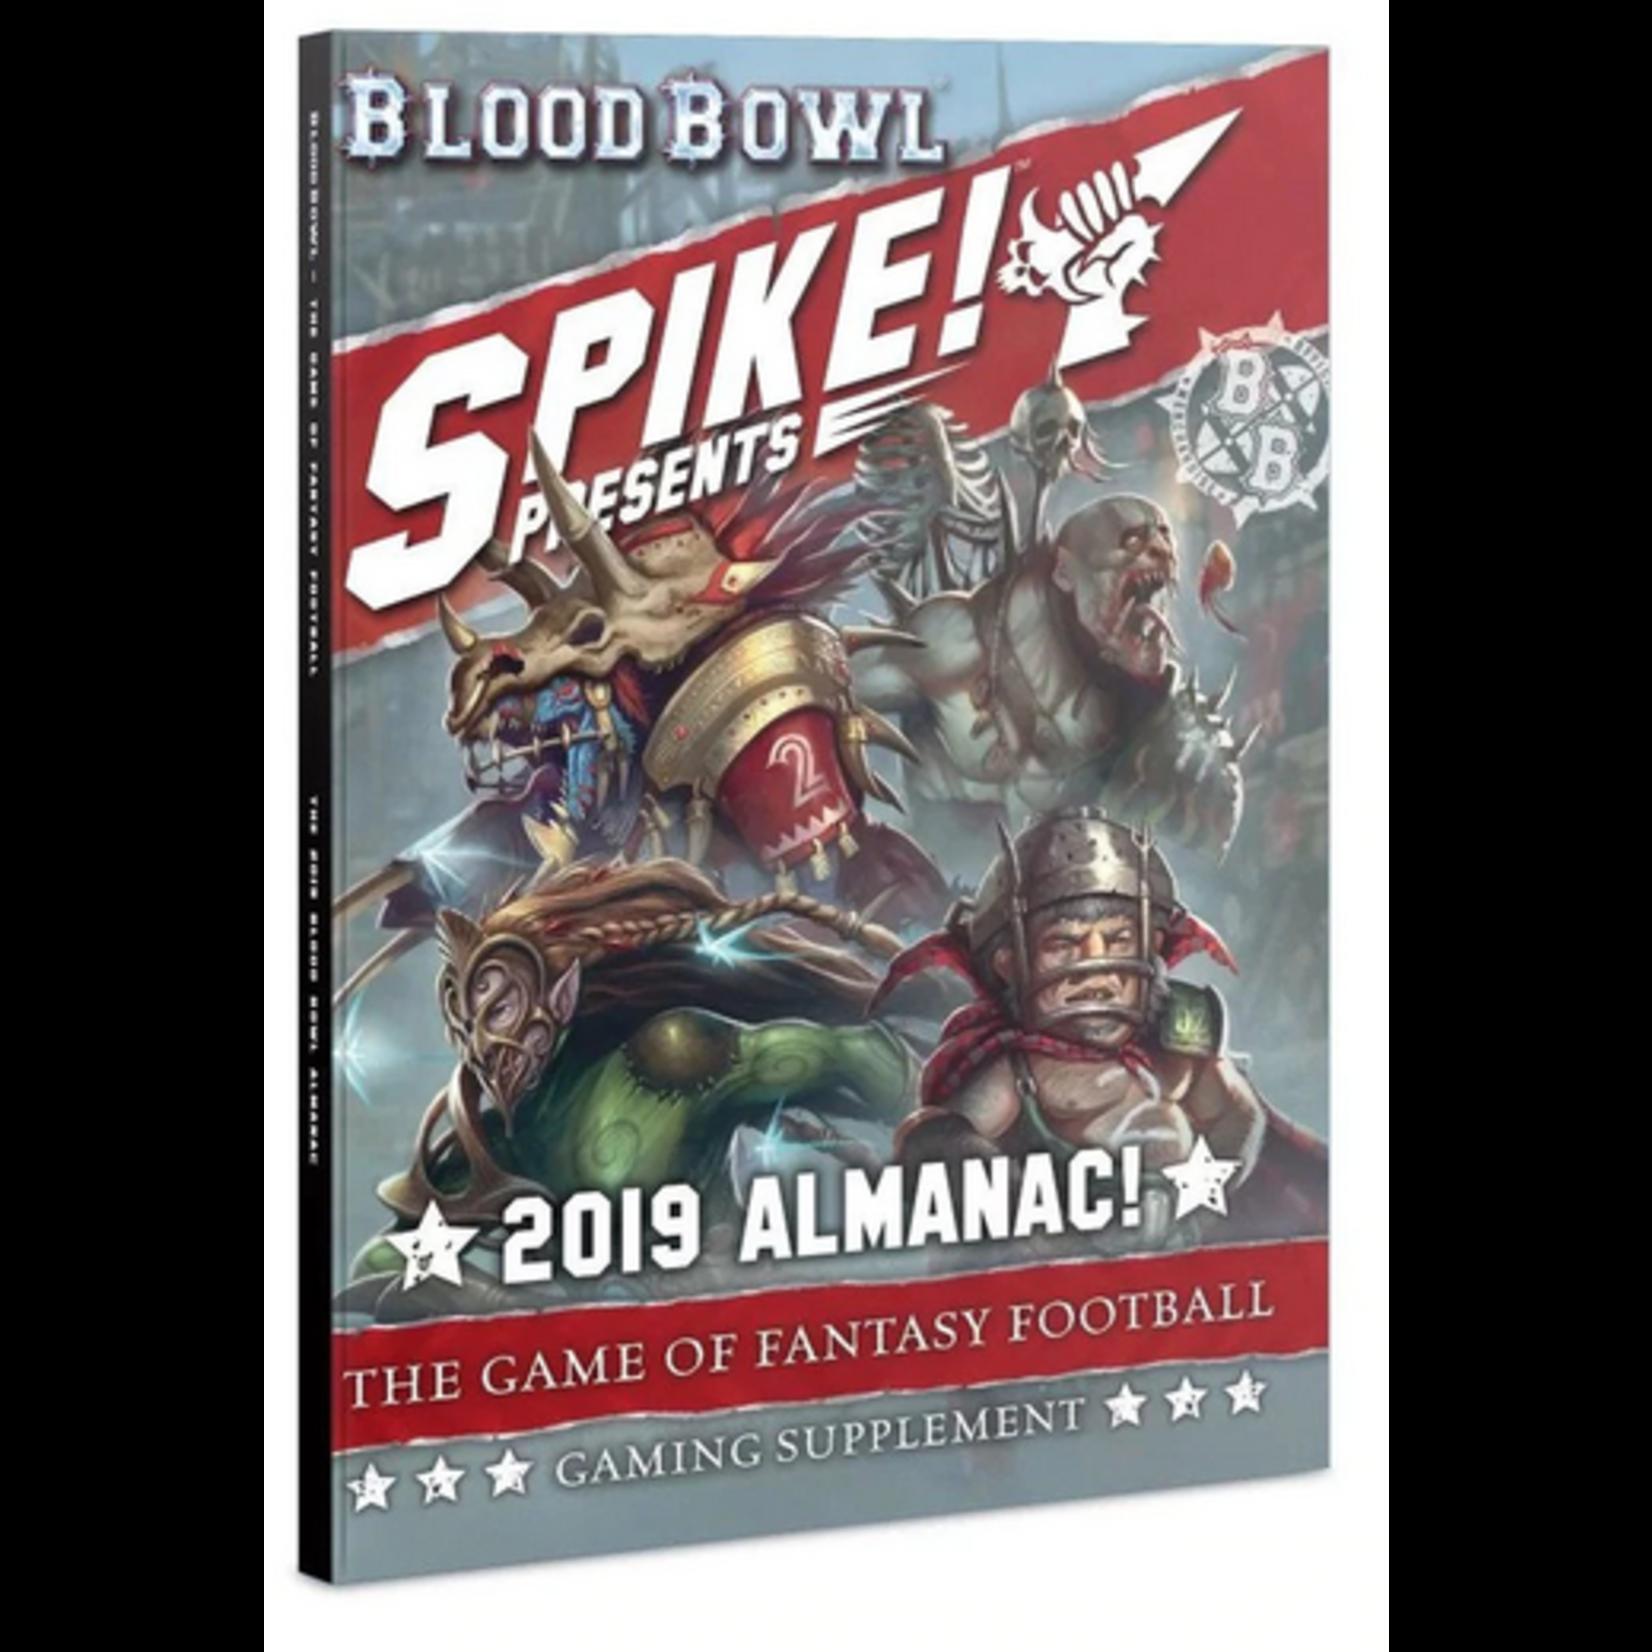 Blood Bowl: Spike 2019 Almanac!